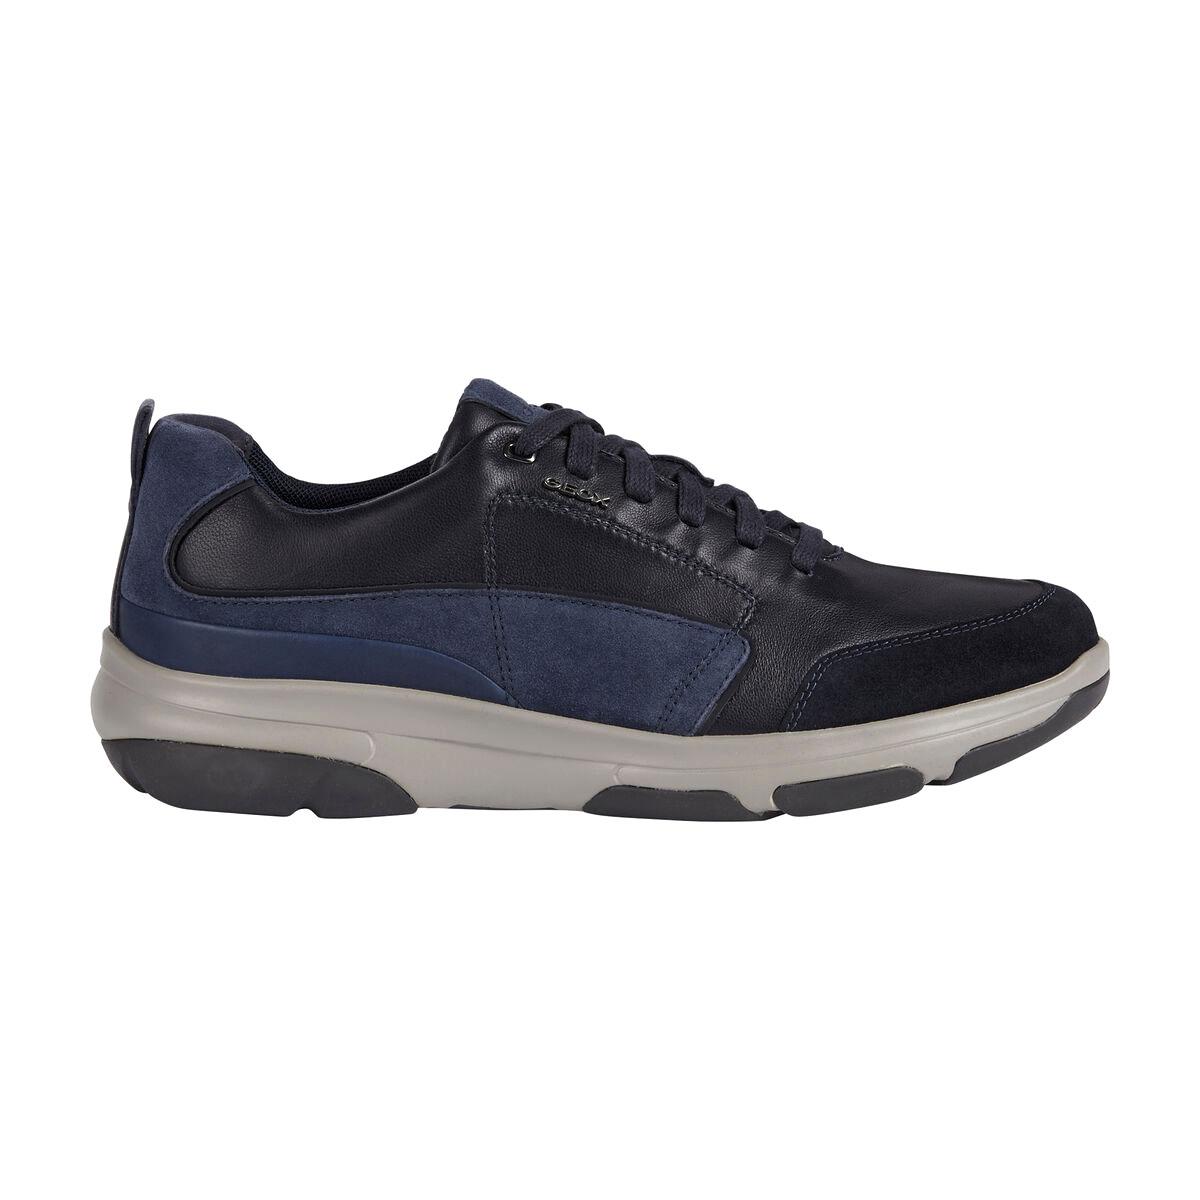 U Xand 2 sneaker